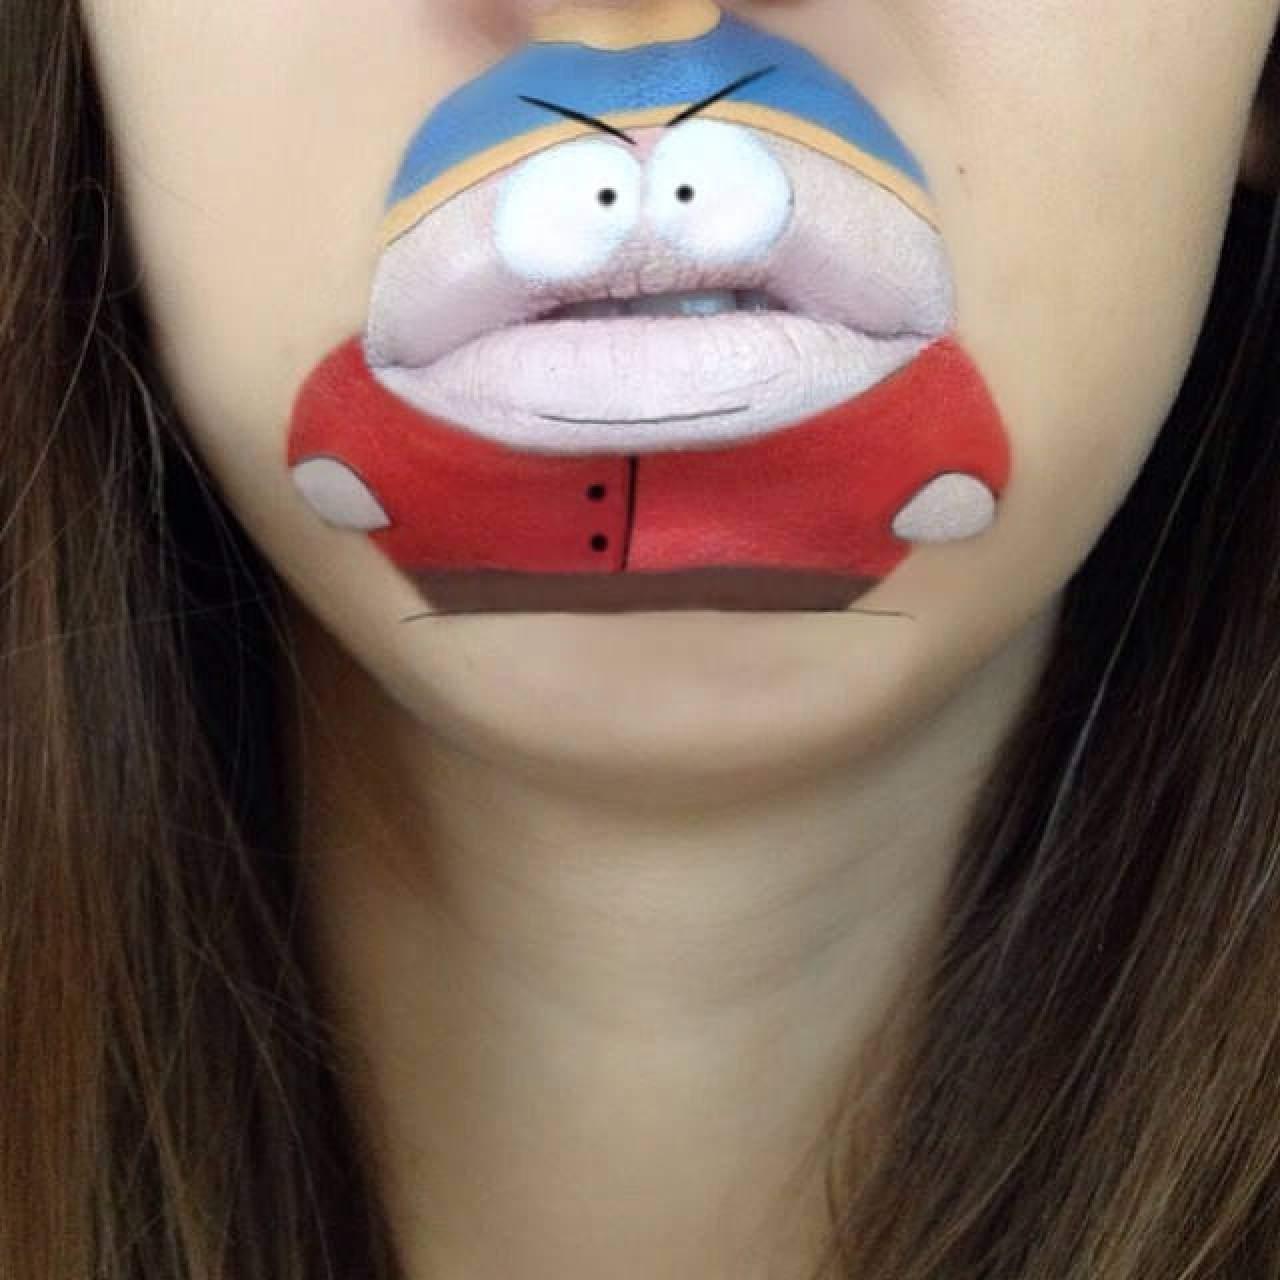 Amazing Cartoon Lip-Art By Laura Jenkinson 18